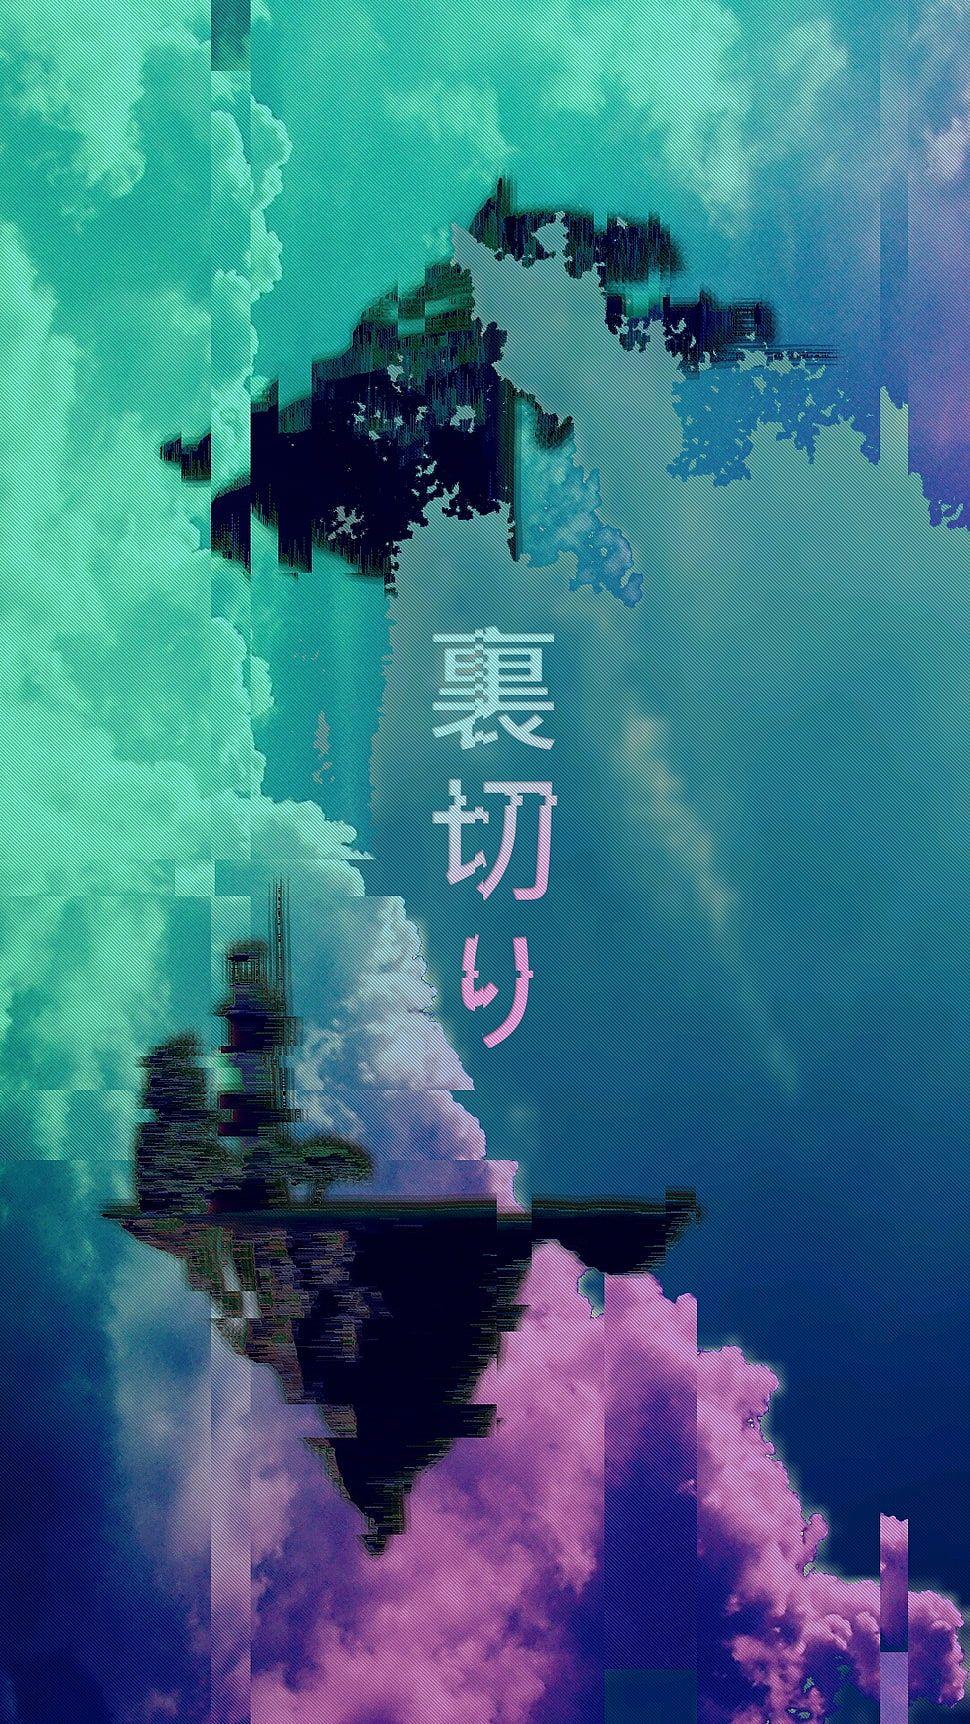 Pin By Dima Uchinin On Wallpapers Hd Scenery Wallpaper Anime Scenery Wallpaper Anime Wallpaper Download